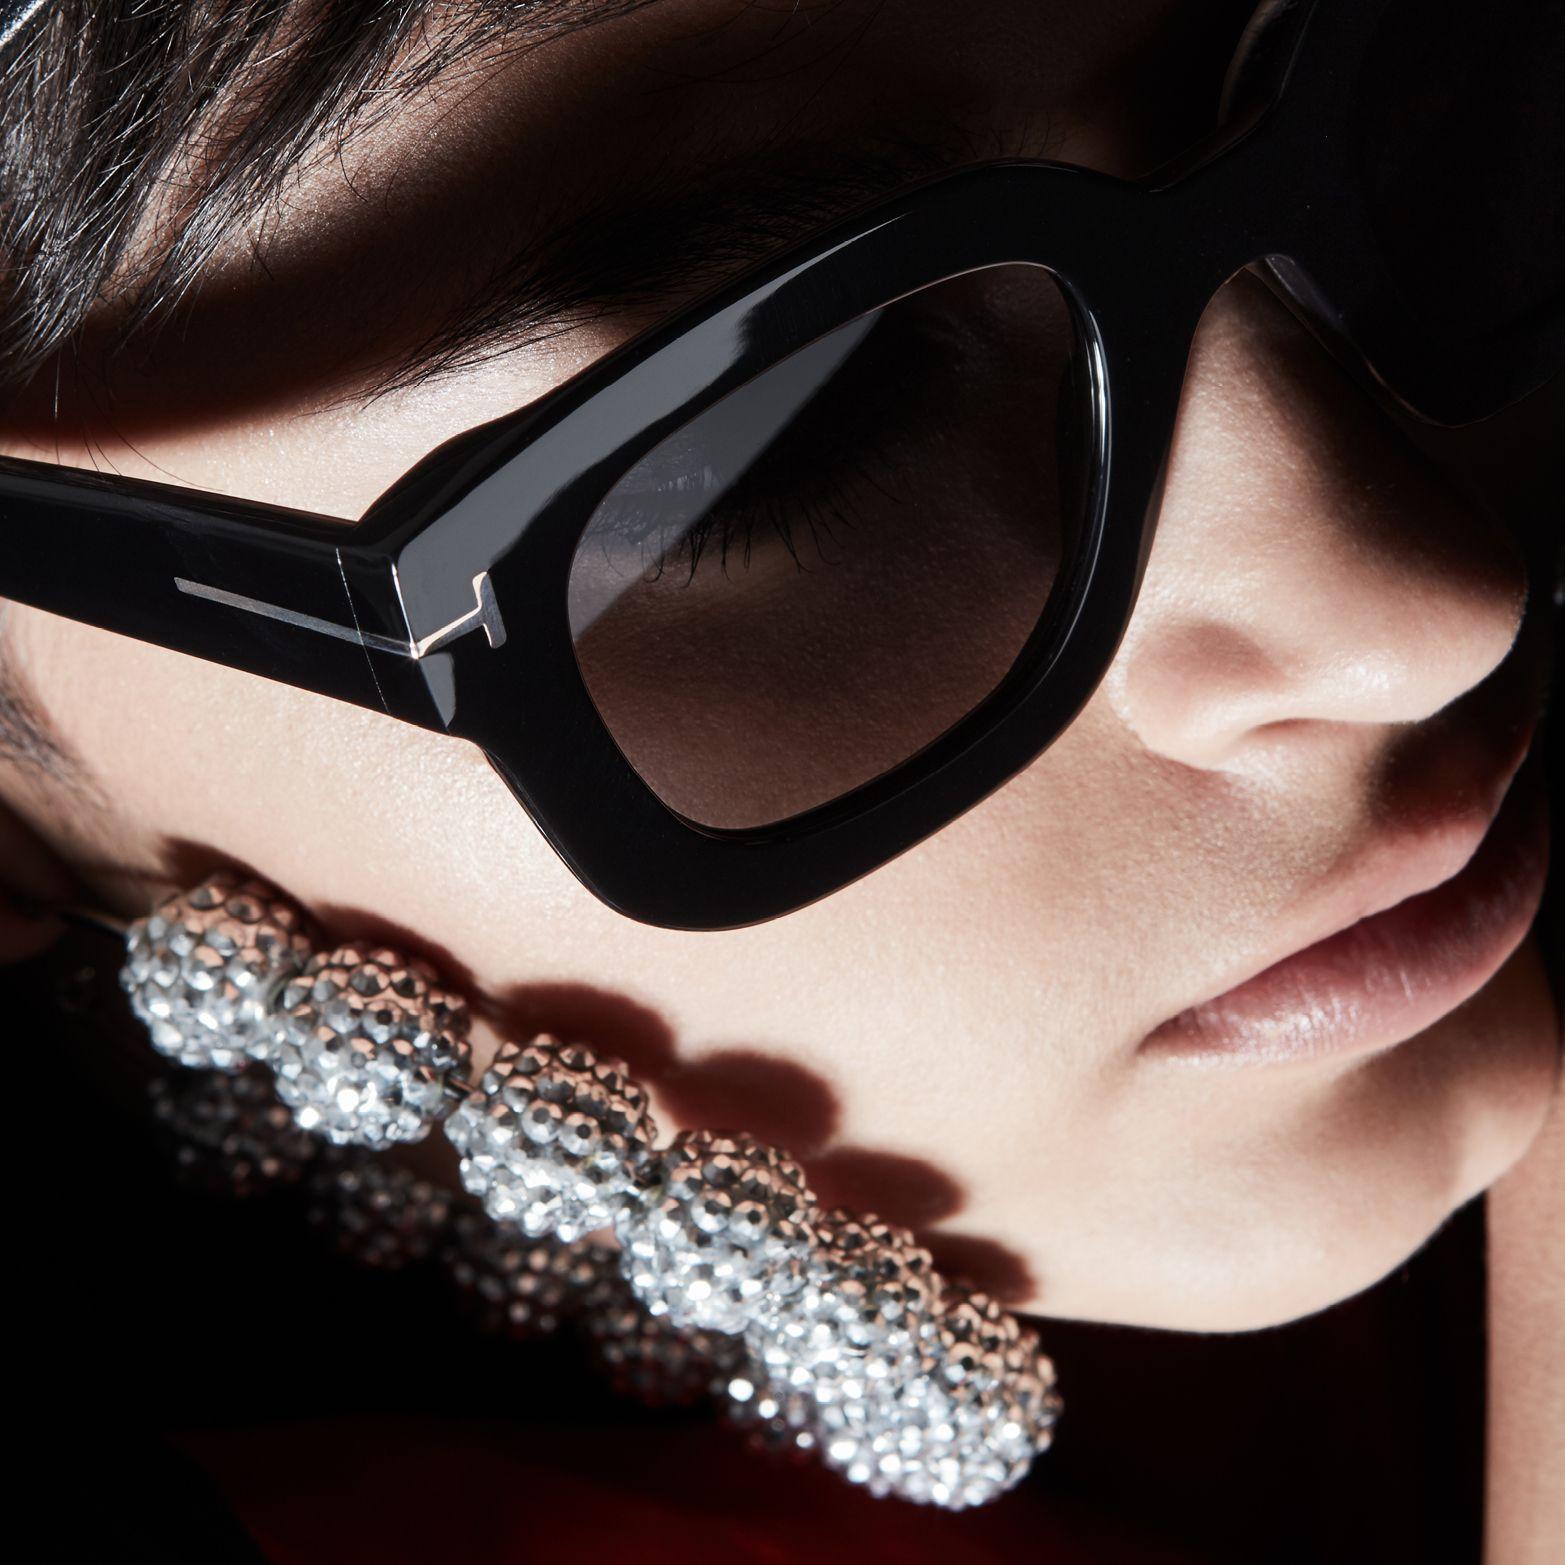 600a57cca788 Pia sunglasses in 2019 | TOM FORD EYEWEAR | Sunglasses, Tom ford ...